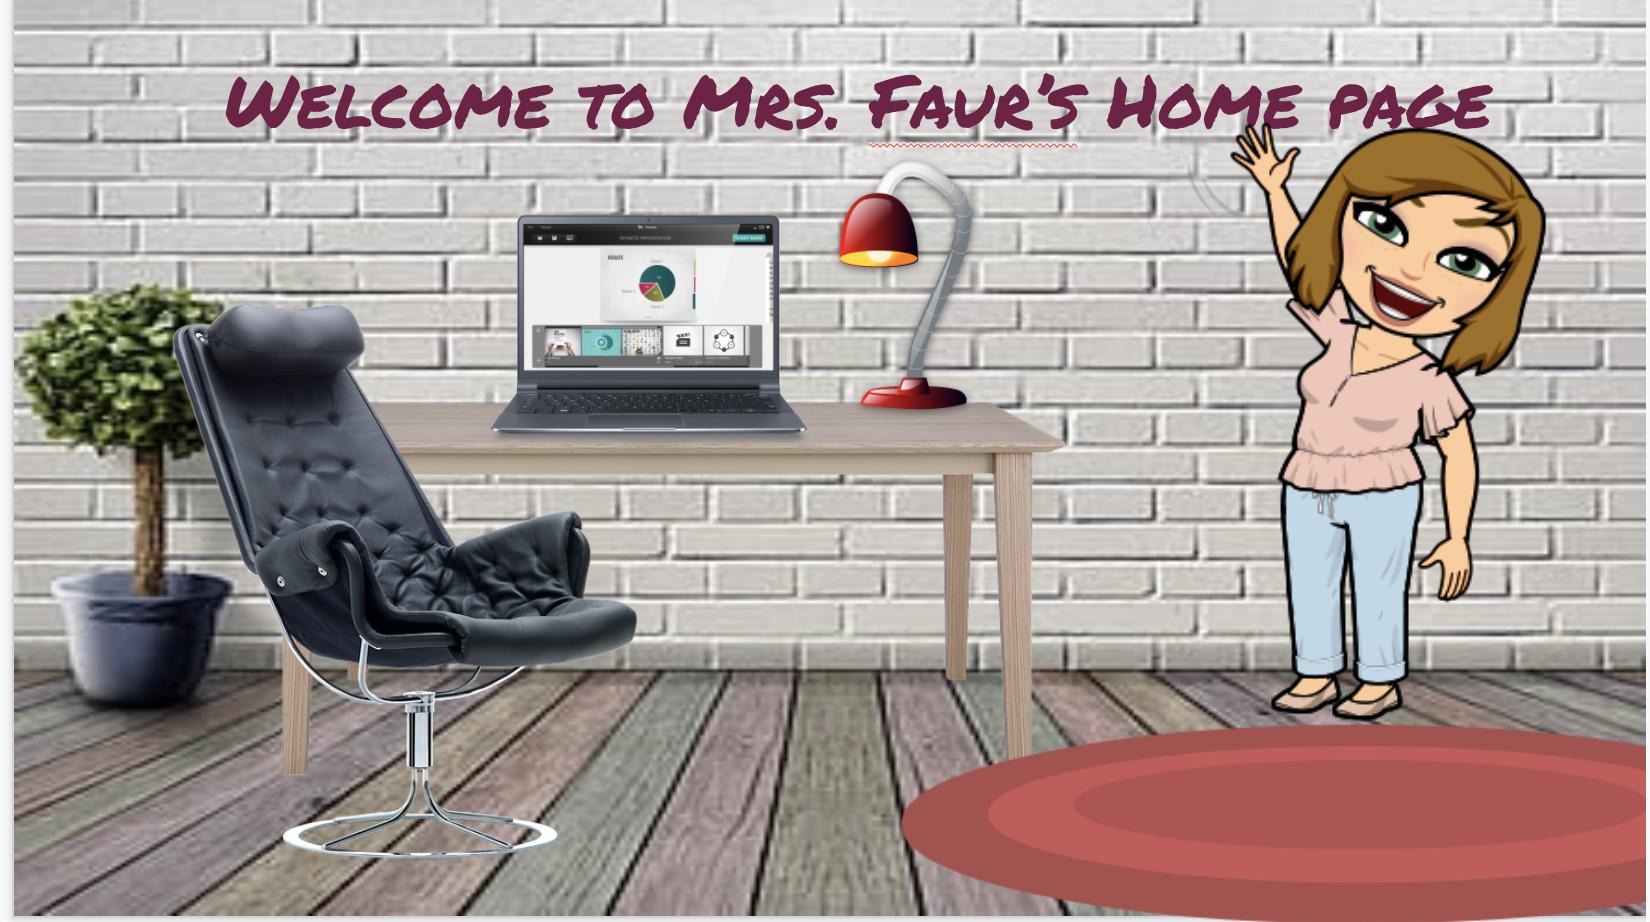 Mrs. Faur's HomePage